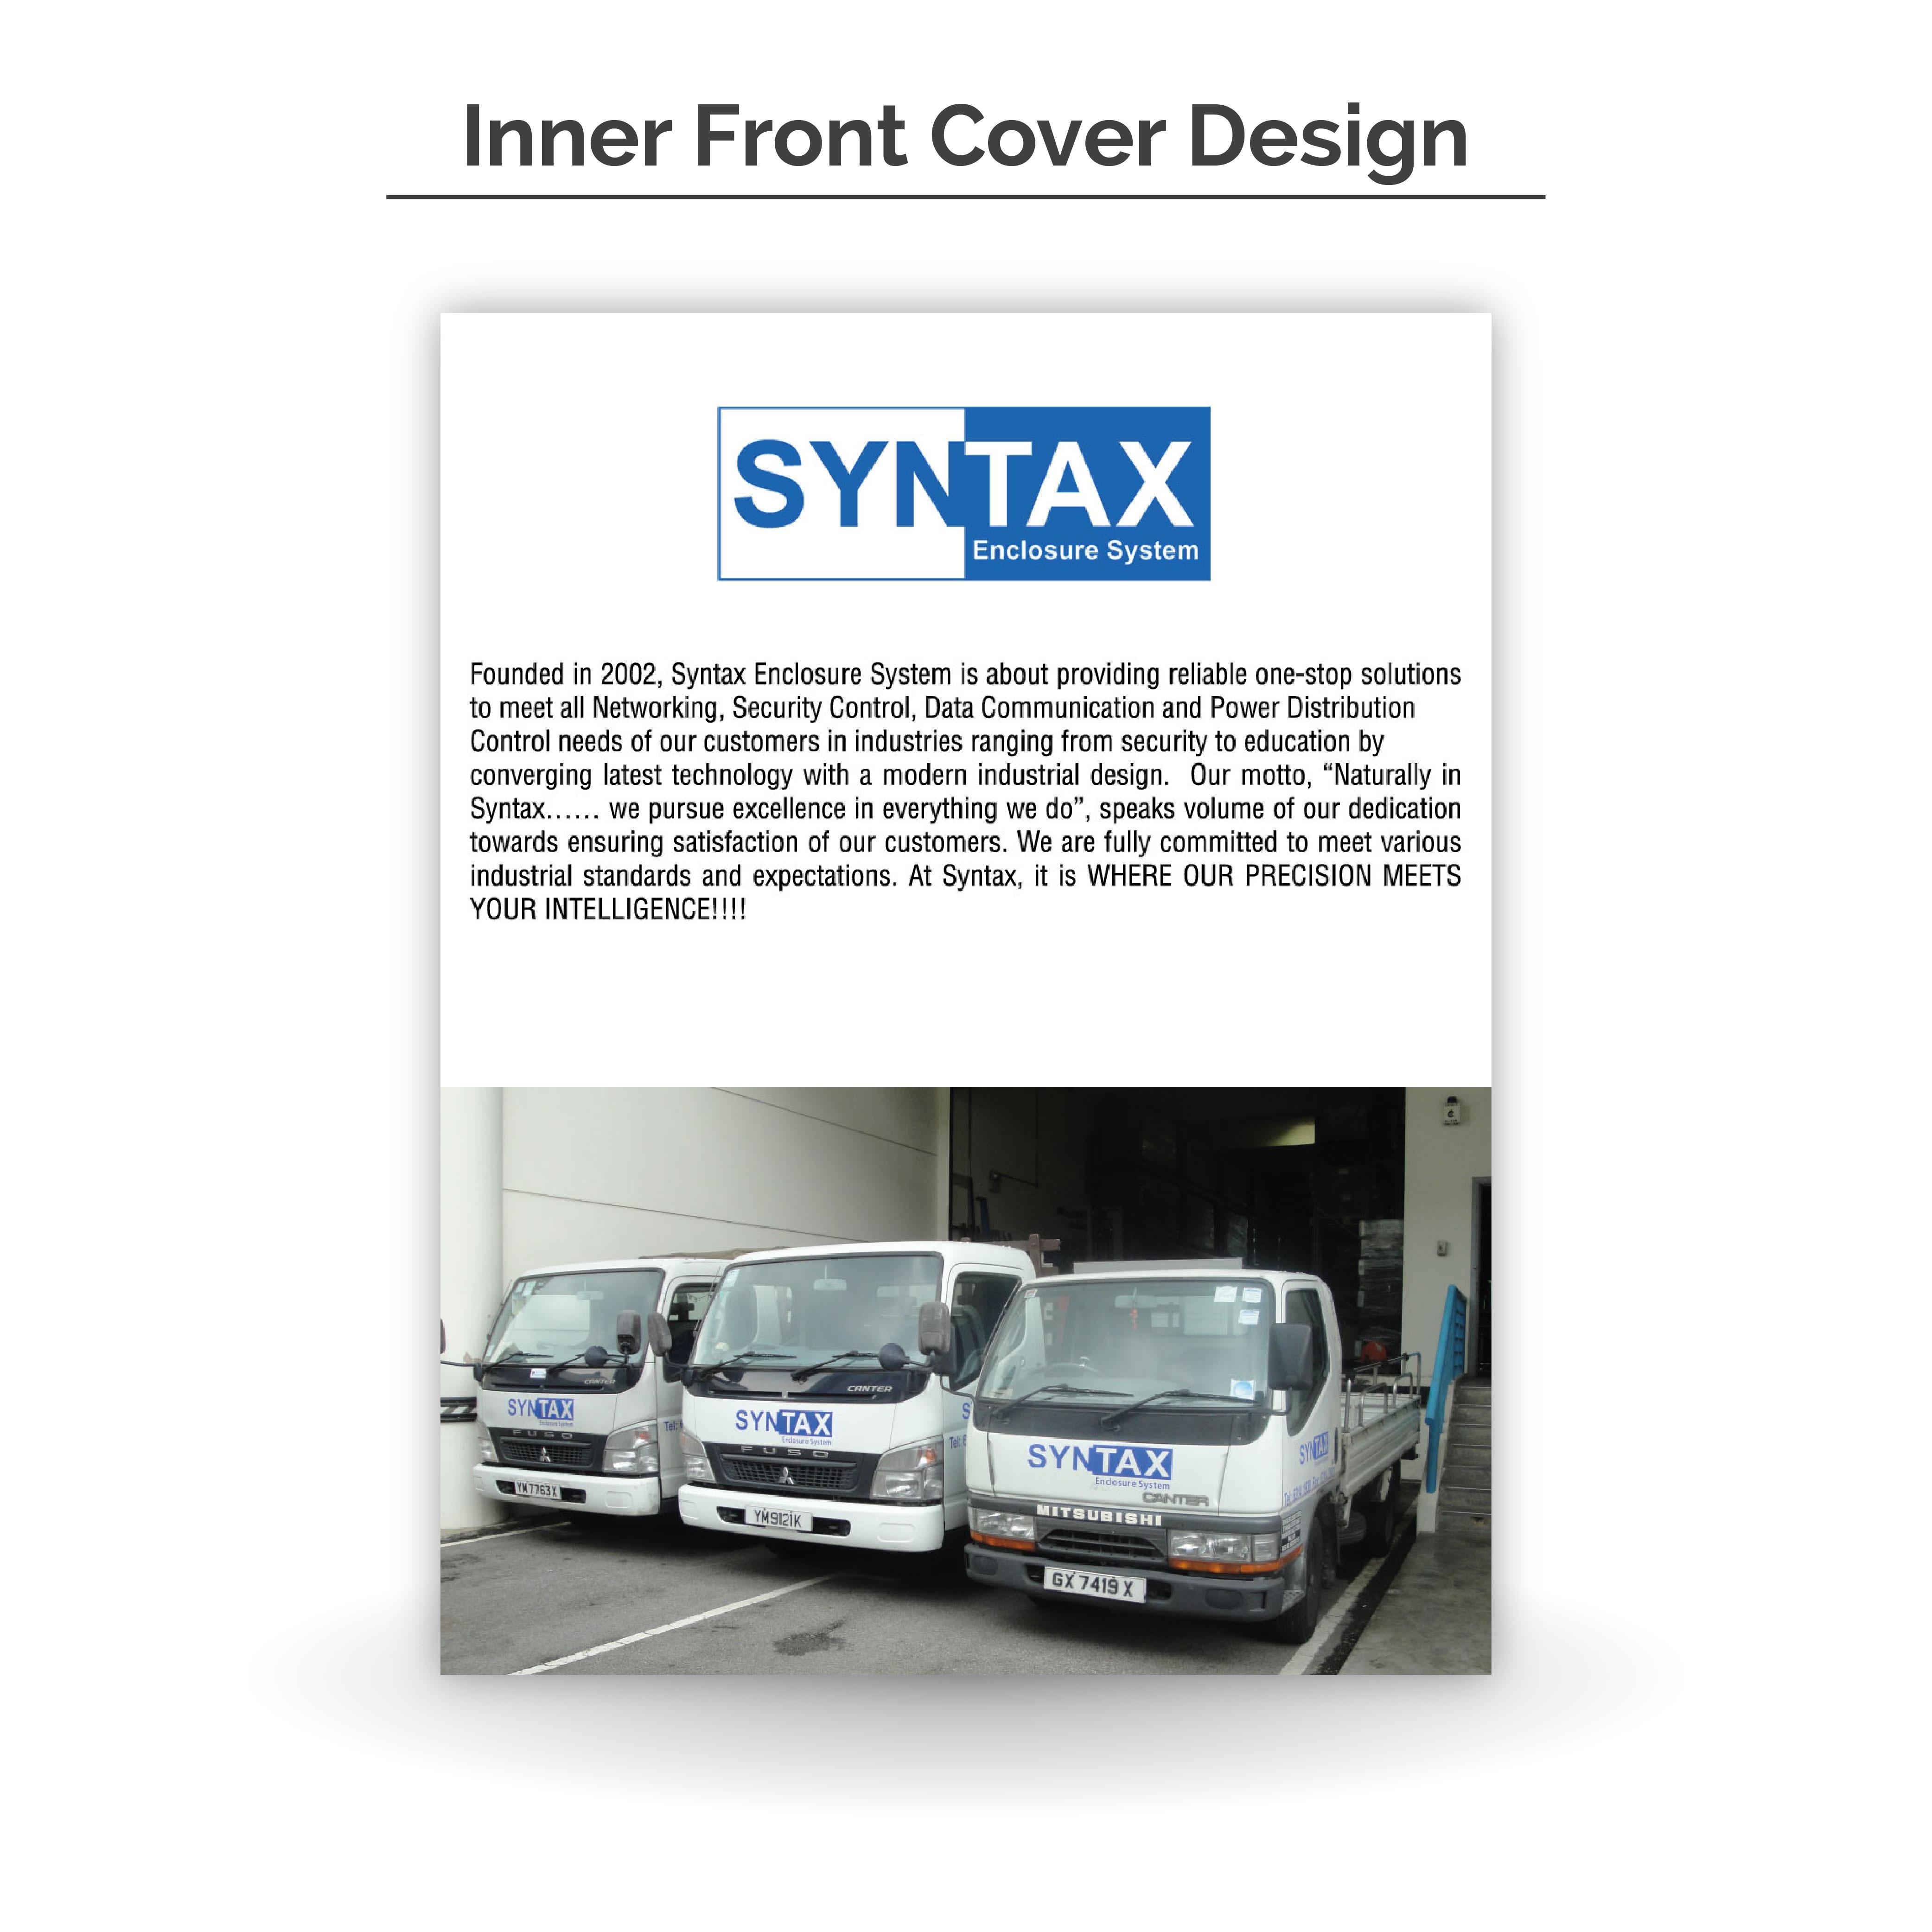 Syntax Calendar 2017